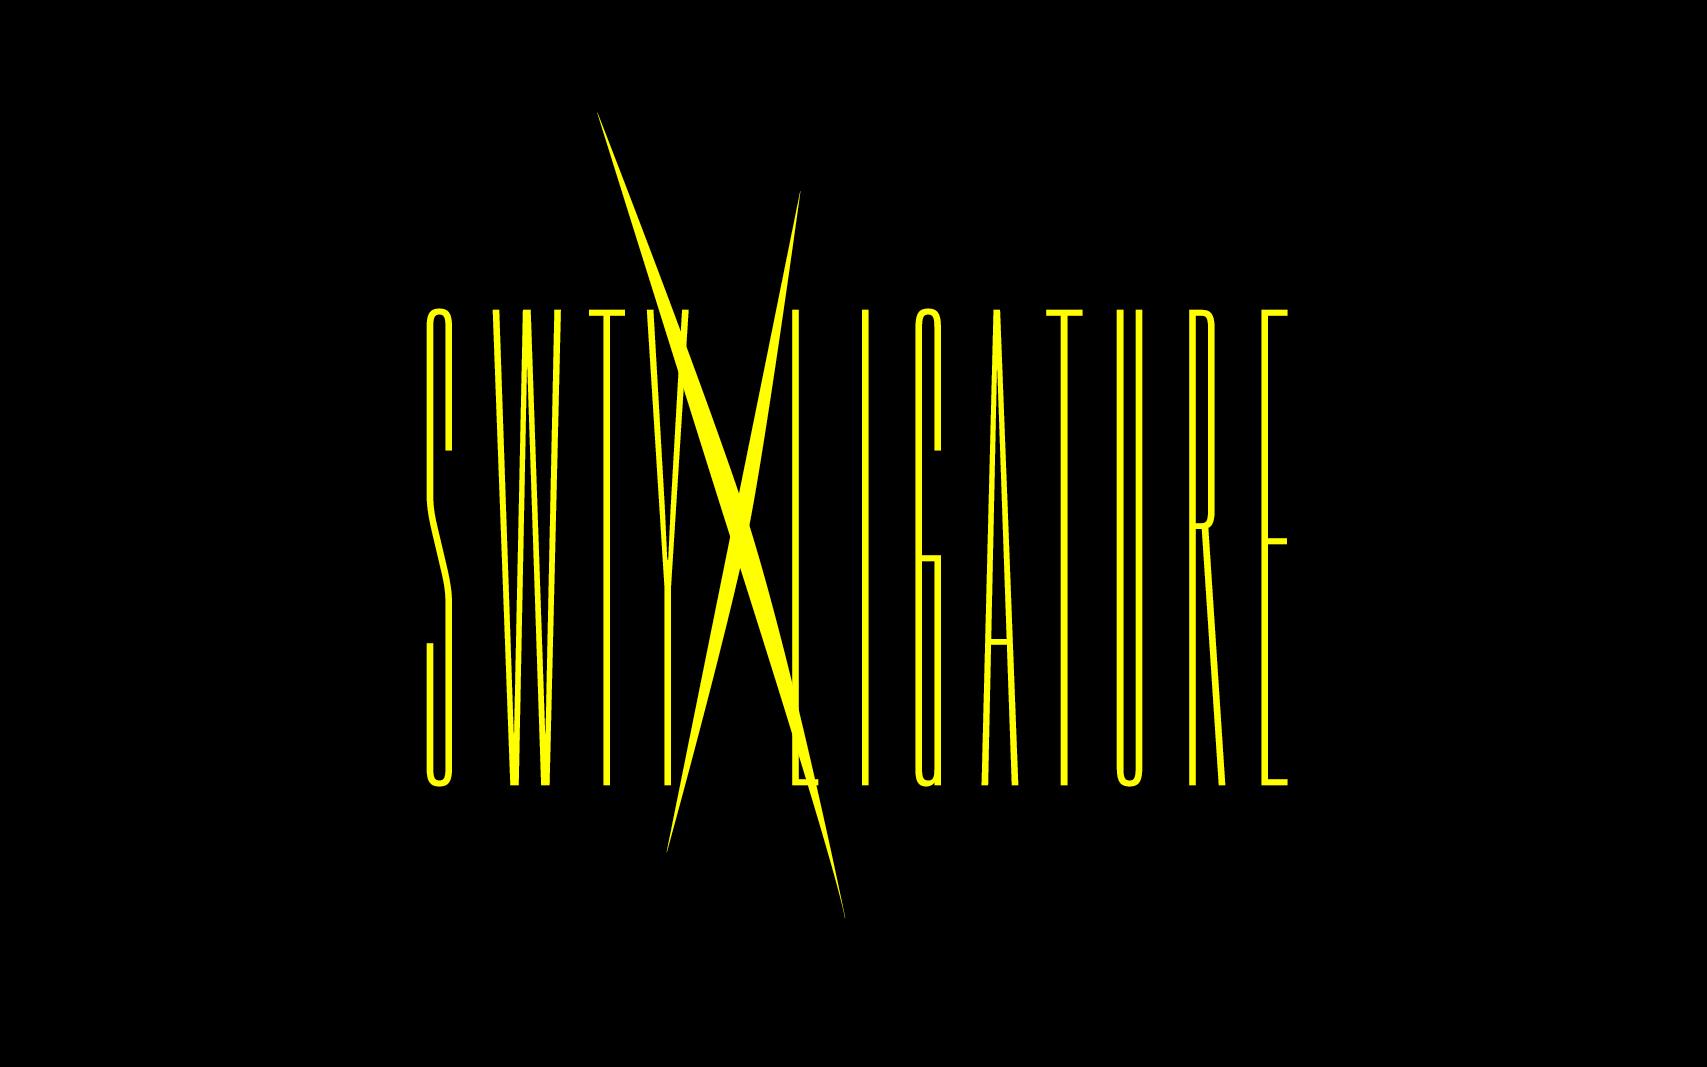 swty x ligature_yellow_2